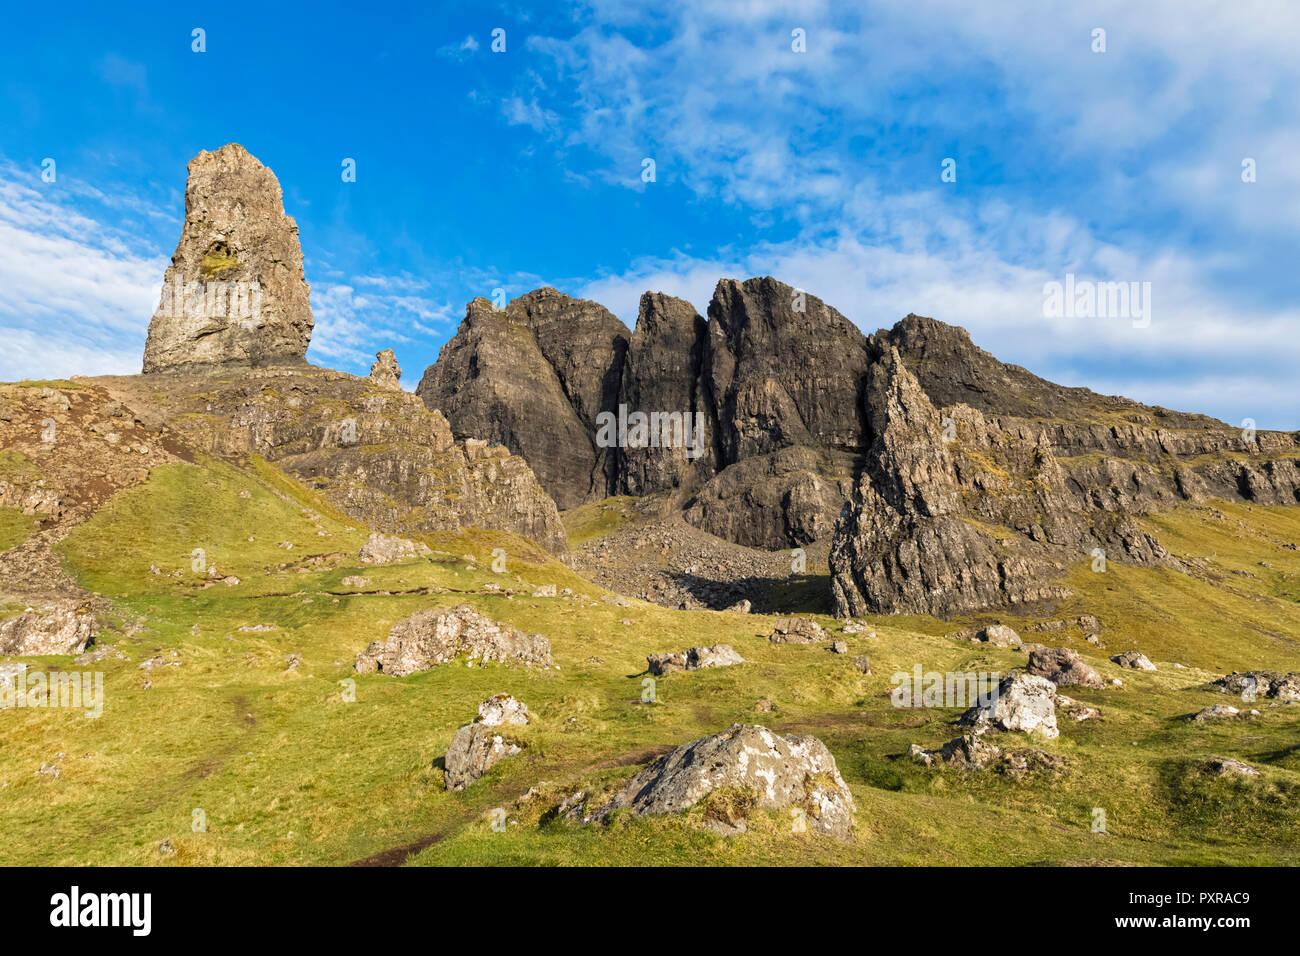 UK, Scotland, Inner Hebrides, Isle of Skye, Trotternish, The Storr - Stock Image